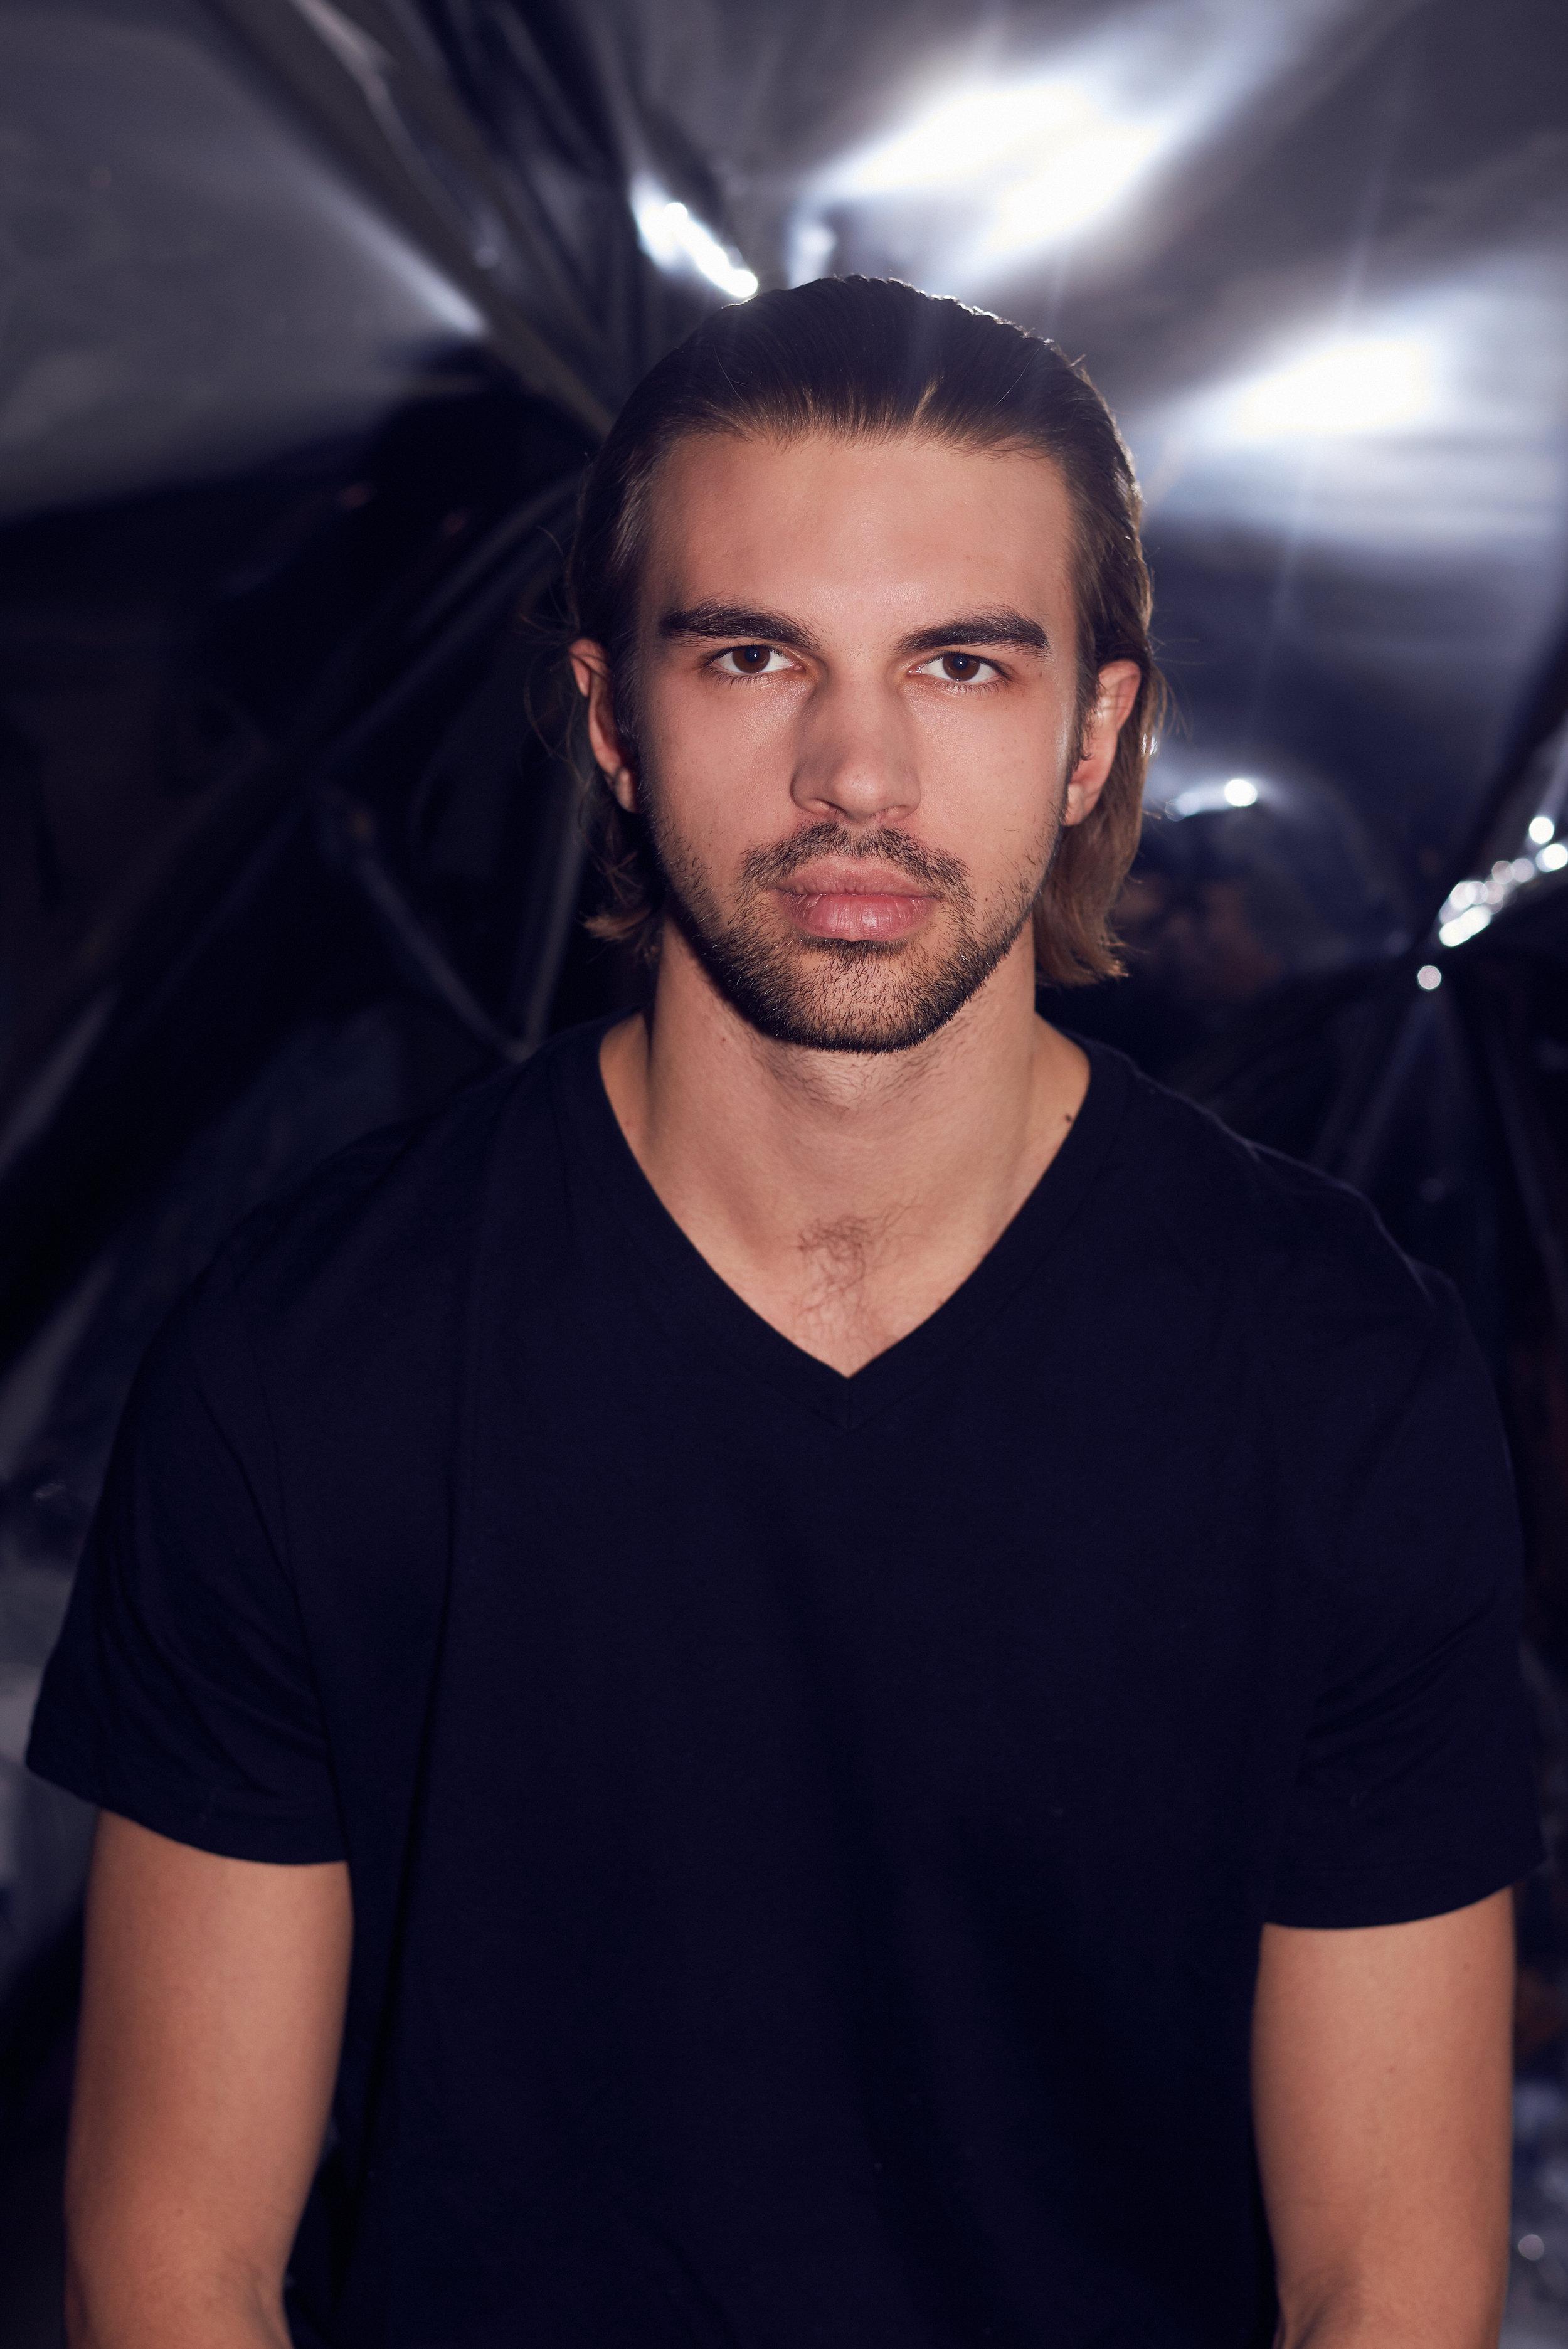 DANIEL MACLAURIAN